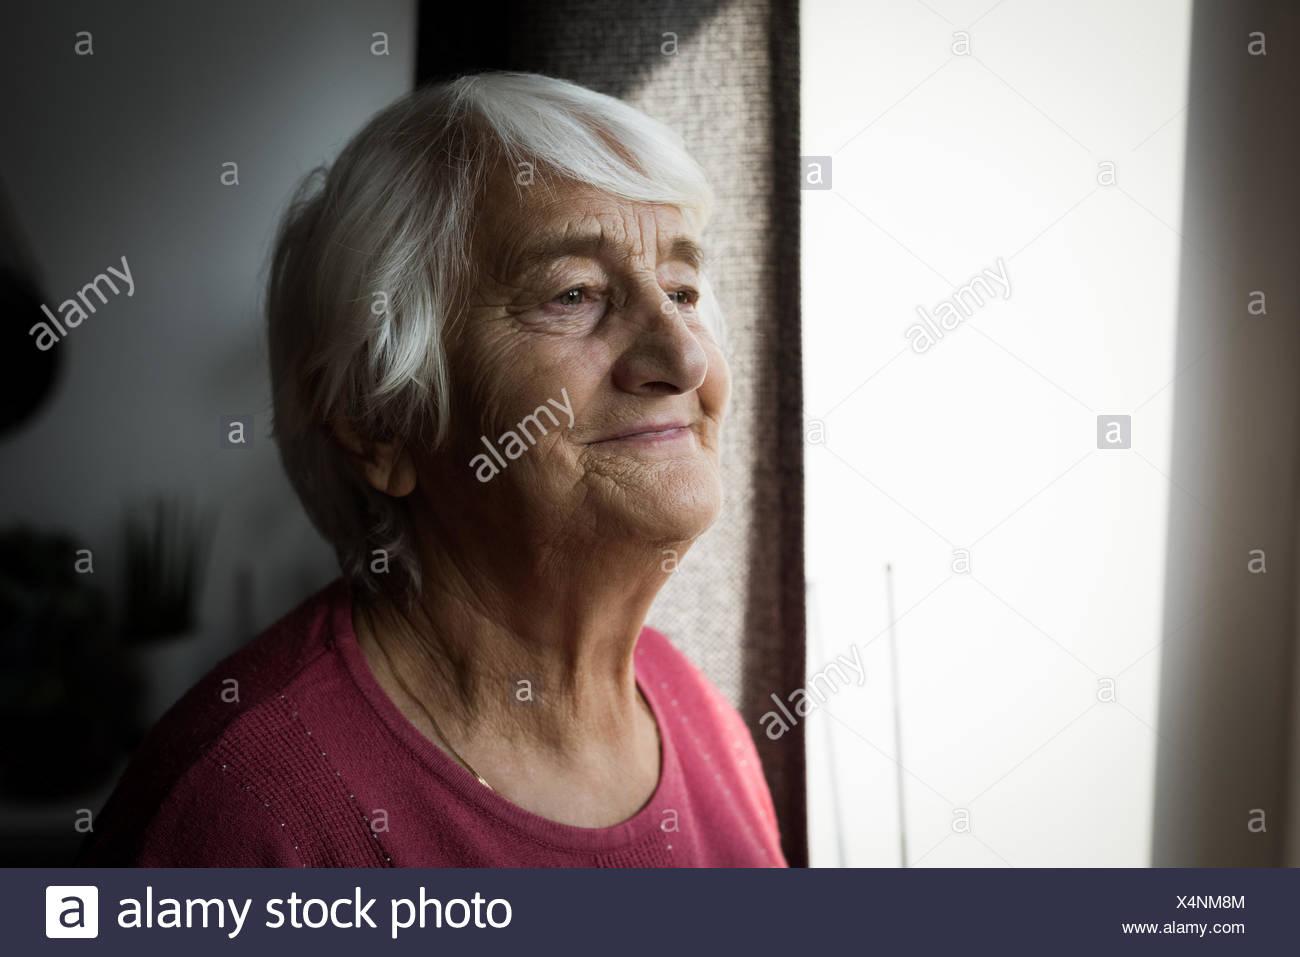 Senior woman standing near window Photo Stock